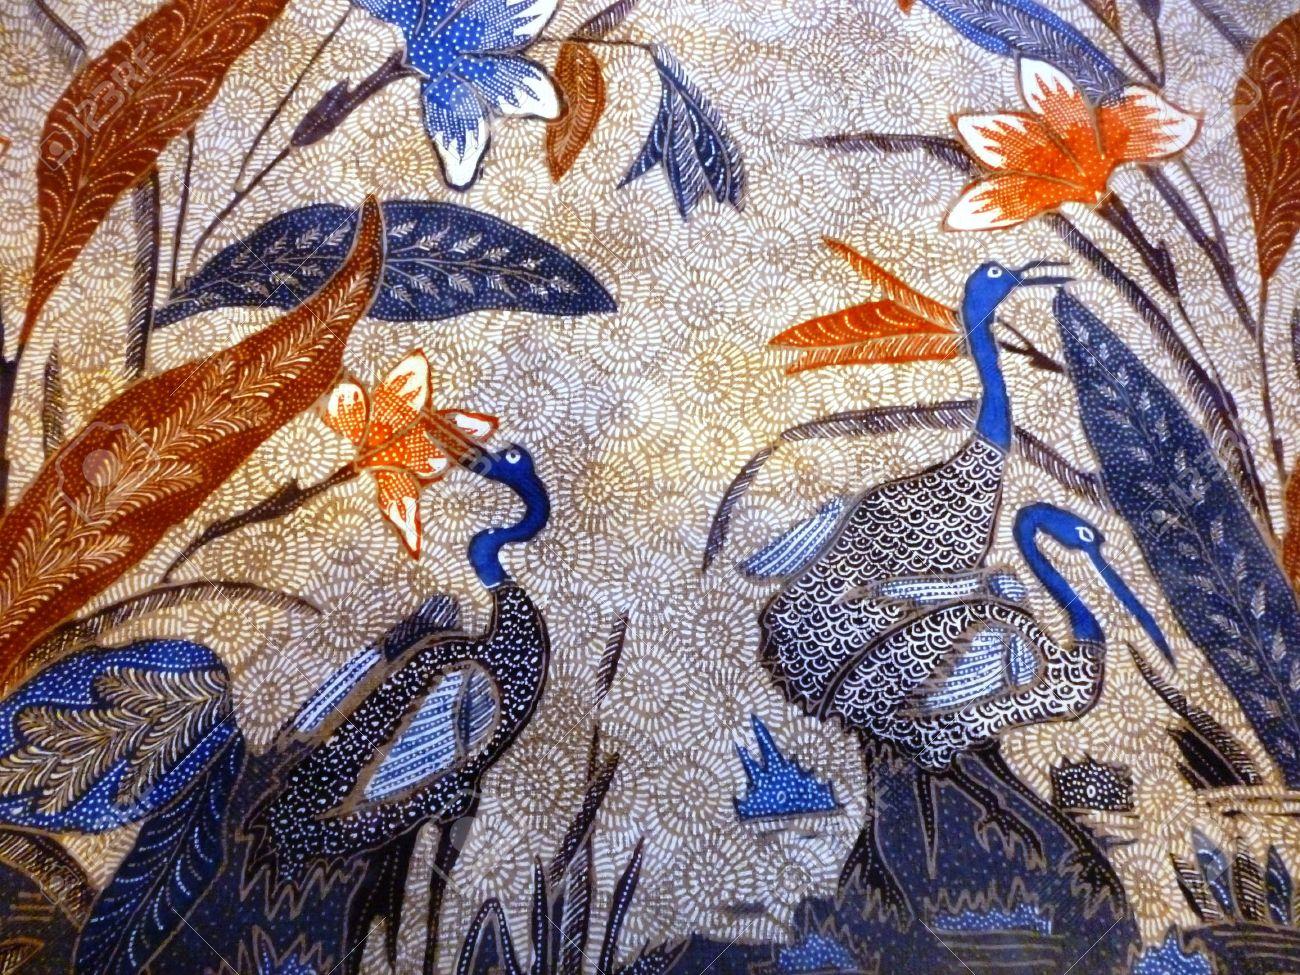 28879765-javanese-batik-seamless-pattern-from-kudus-central-java-indonesia.jpg